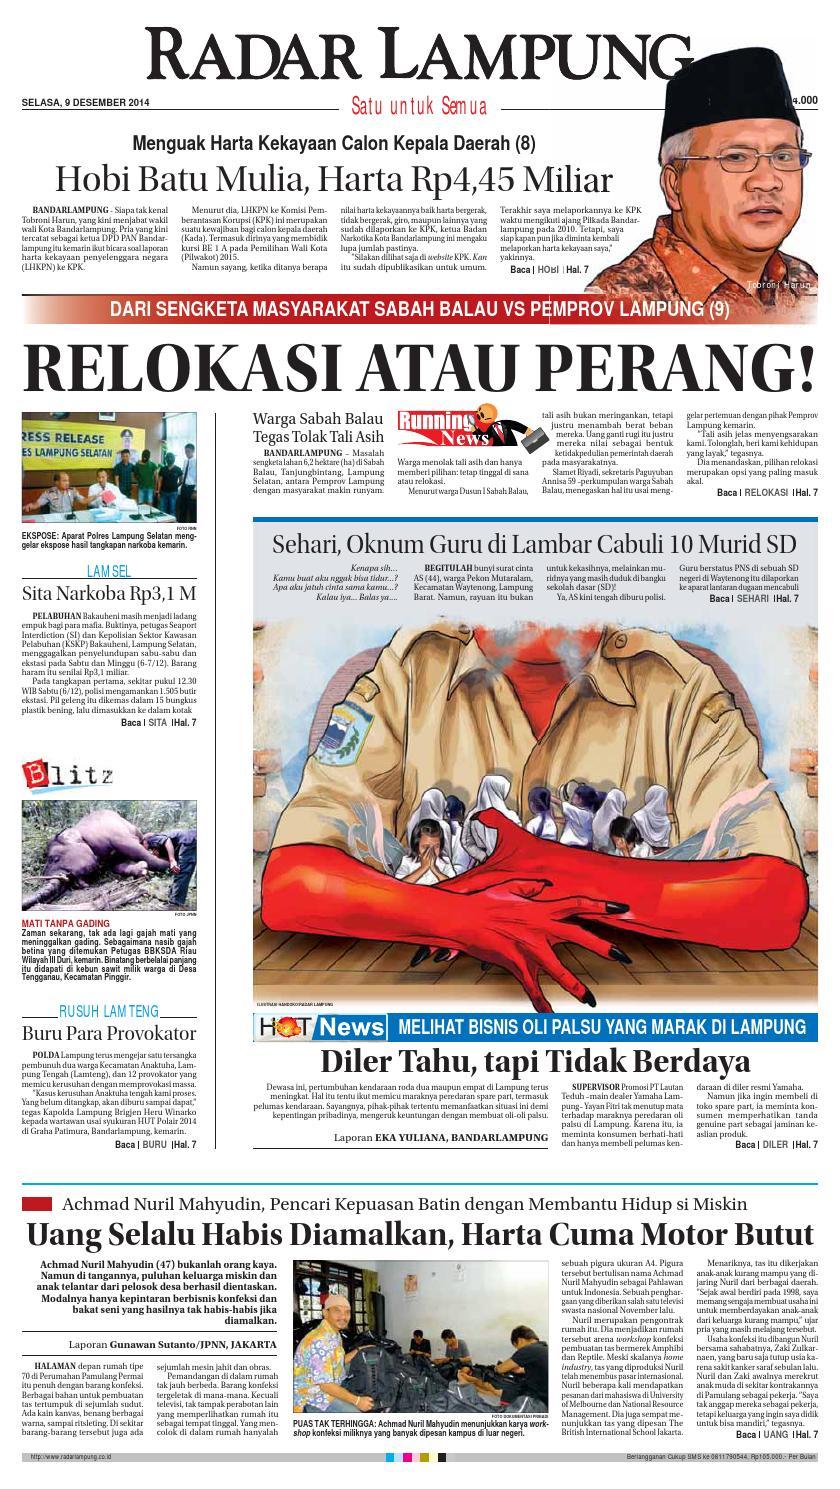 Radar Lampung Selasa 9 Desember 2014 By Ayep Kancee Issuu Mainan Mobil Anak Tomica Limited Vintage Series Datsun Bluebird 1300 Standard